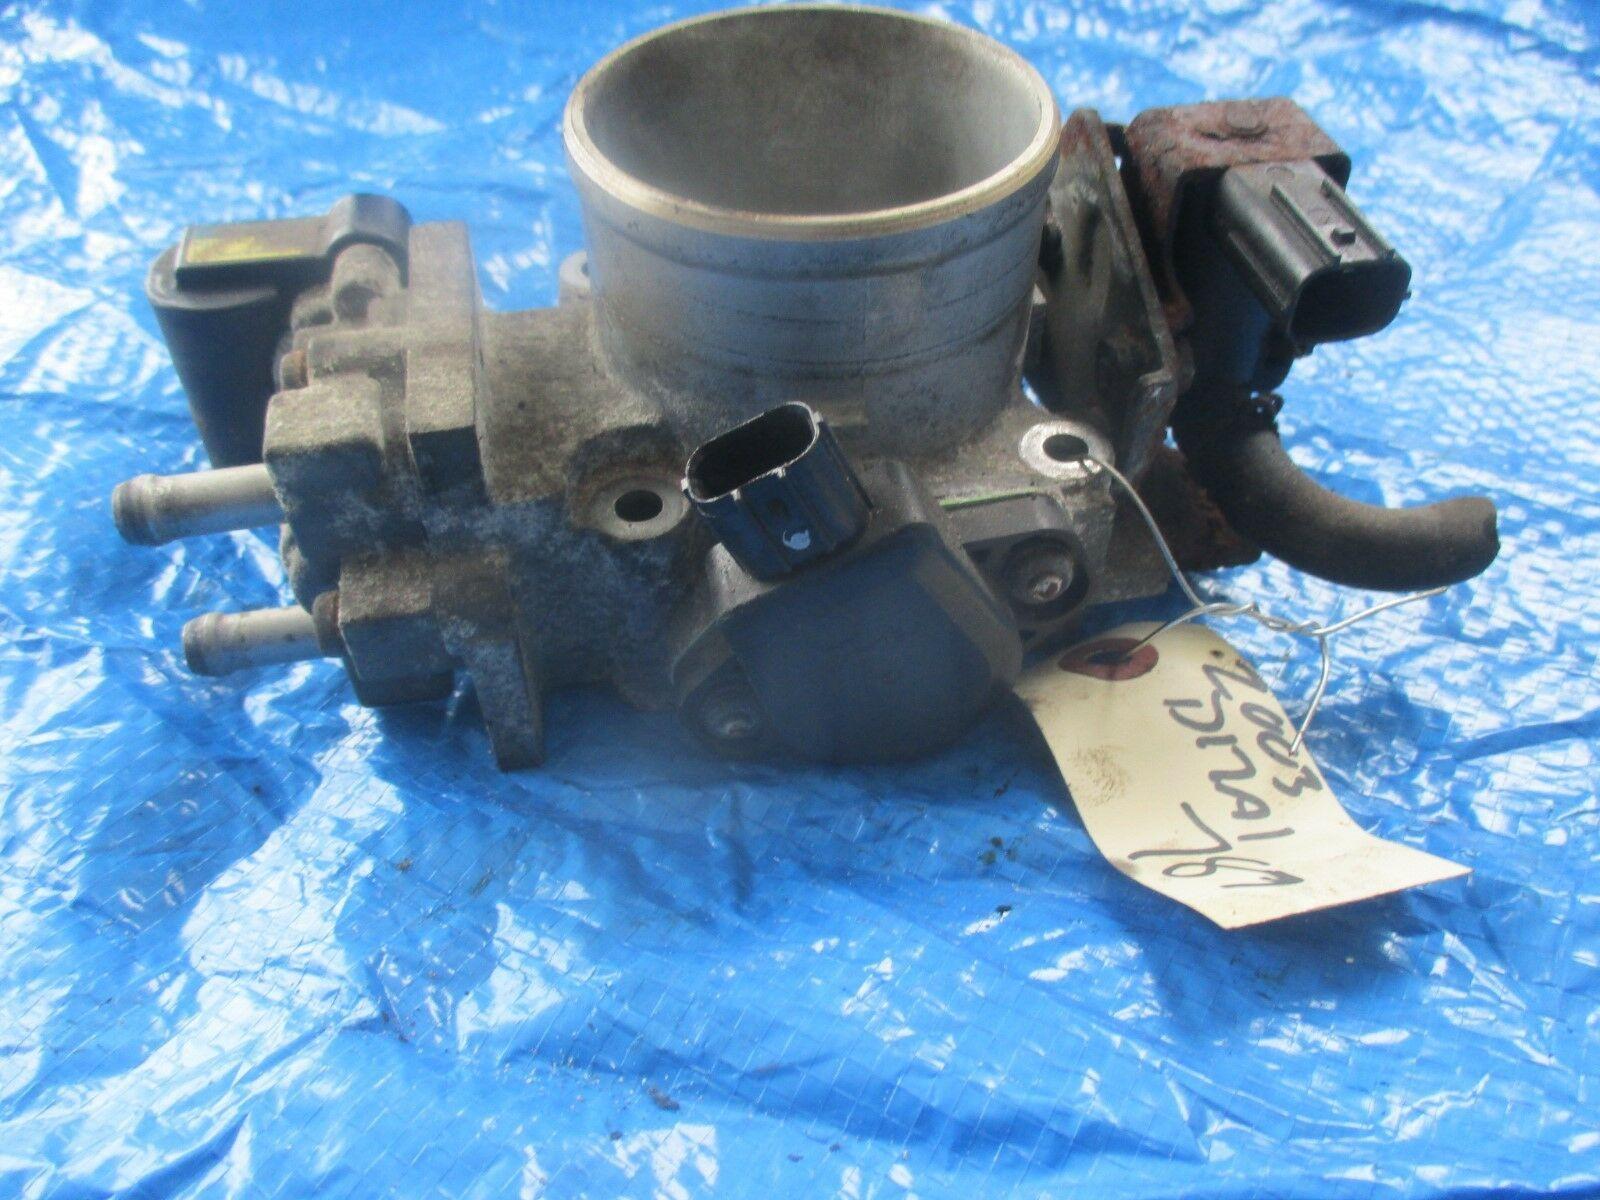 01-05 Honda Civic D17A1 throttle body engine motor D17 D17A1 SOHC OEM TPS VTEC